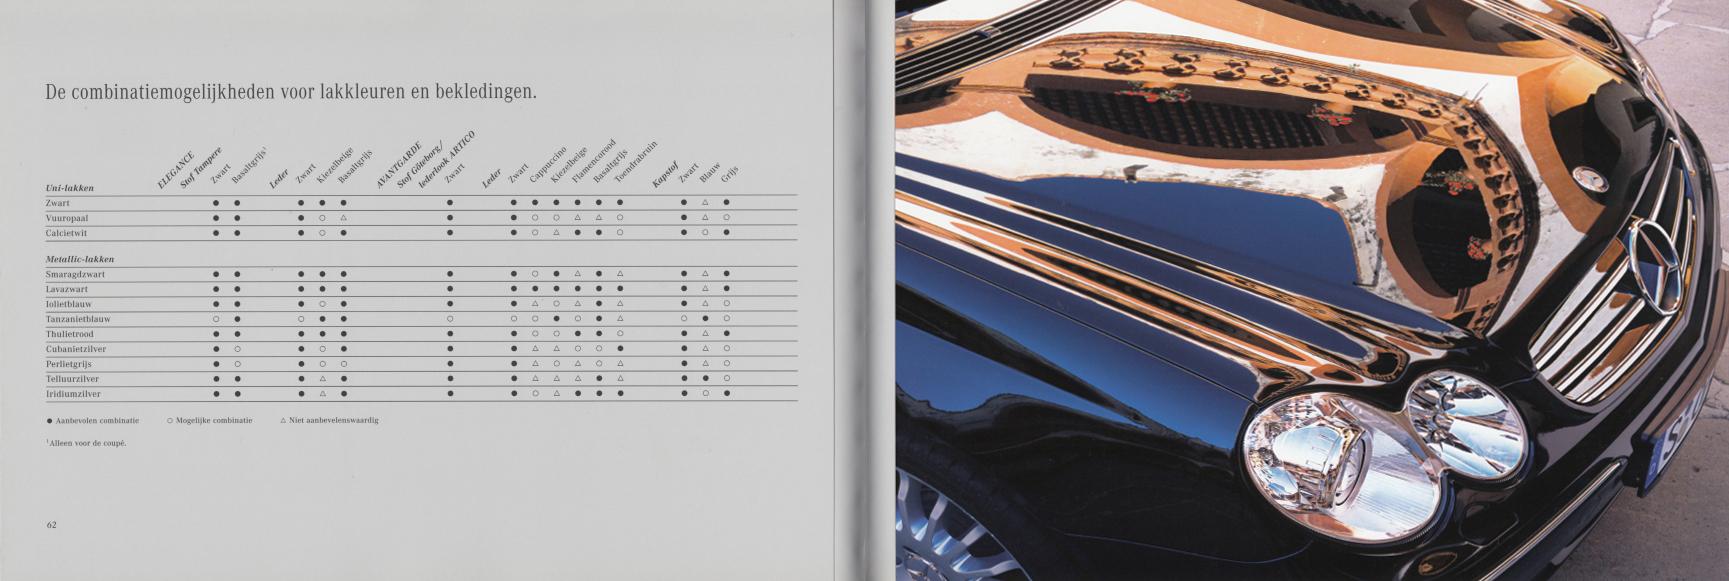 (A/C209): Catálogo 2006 - neerlandês 032